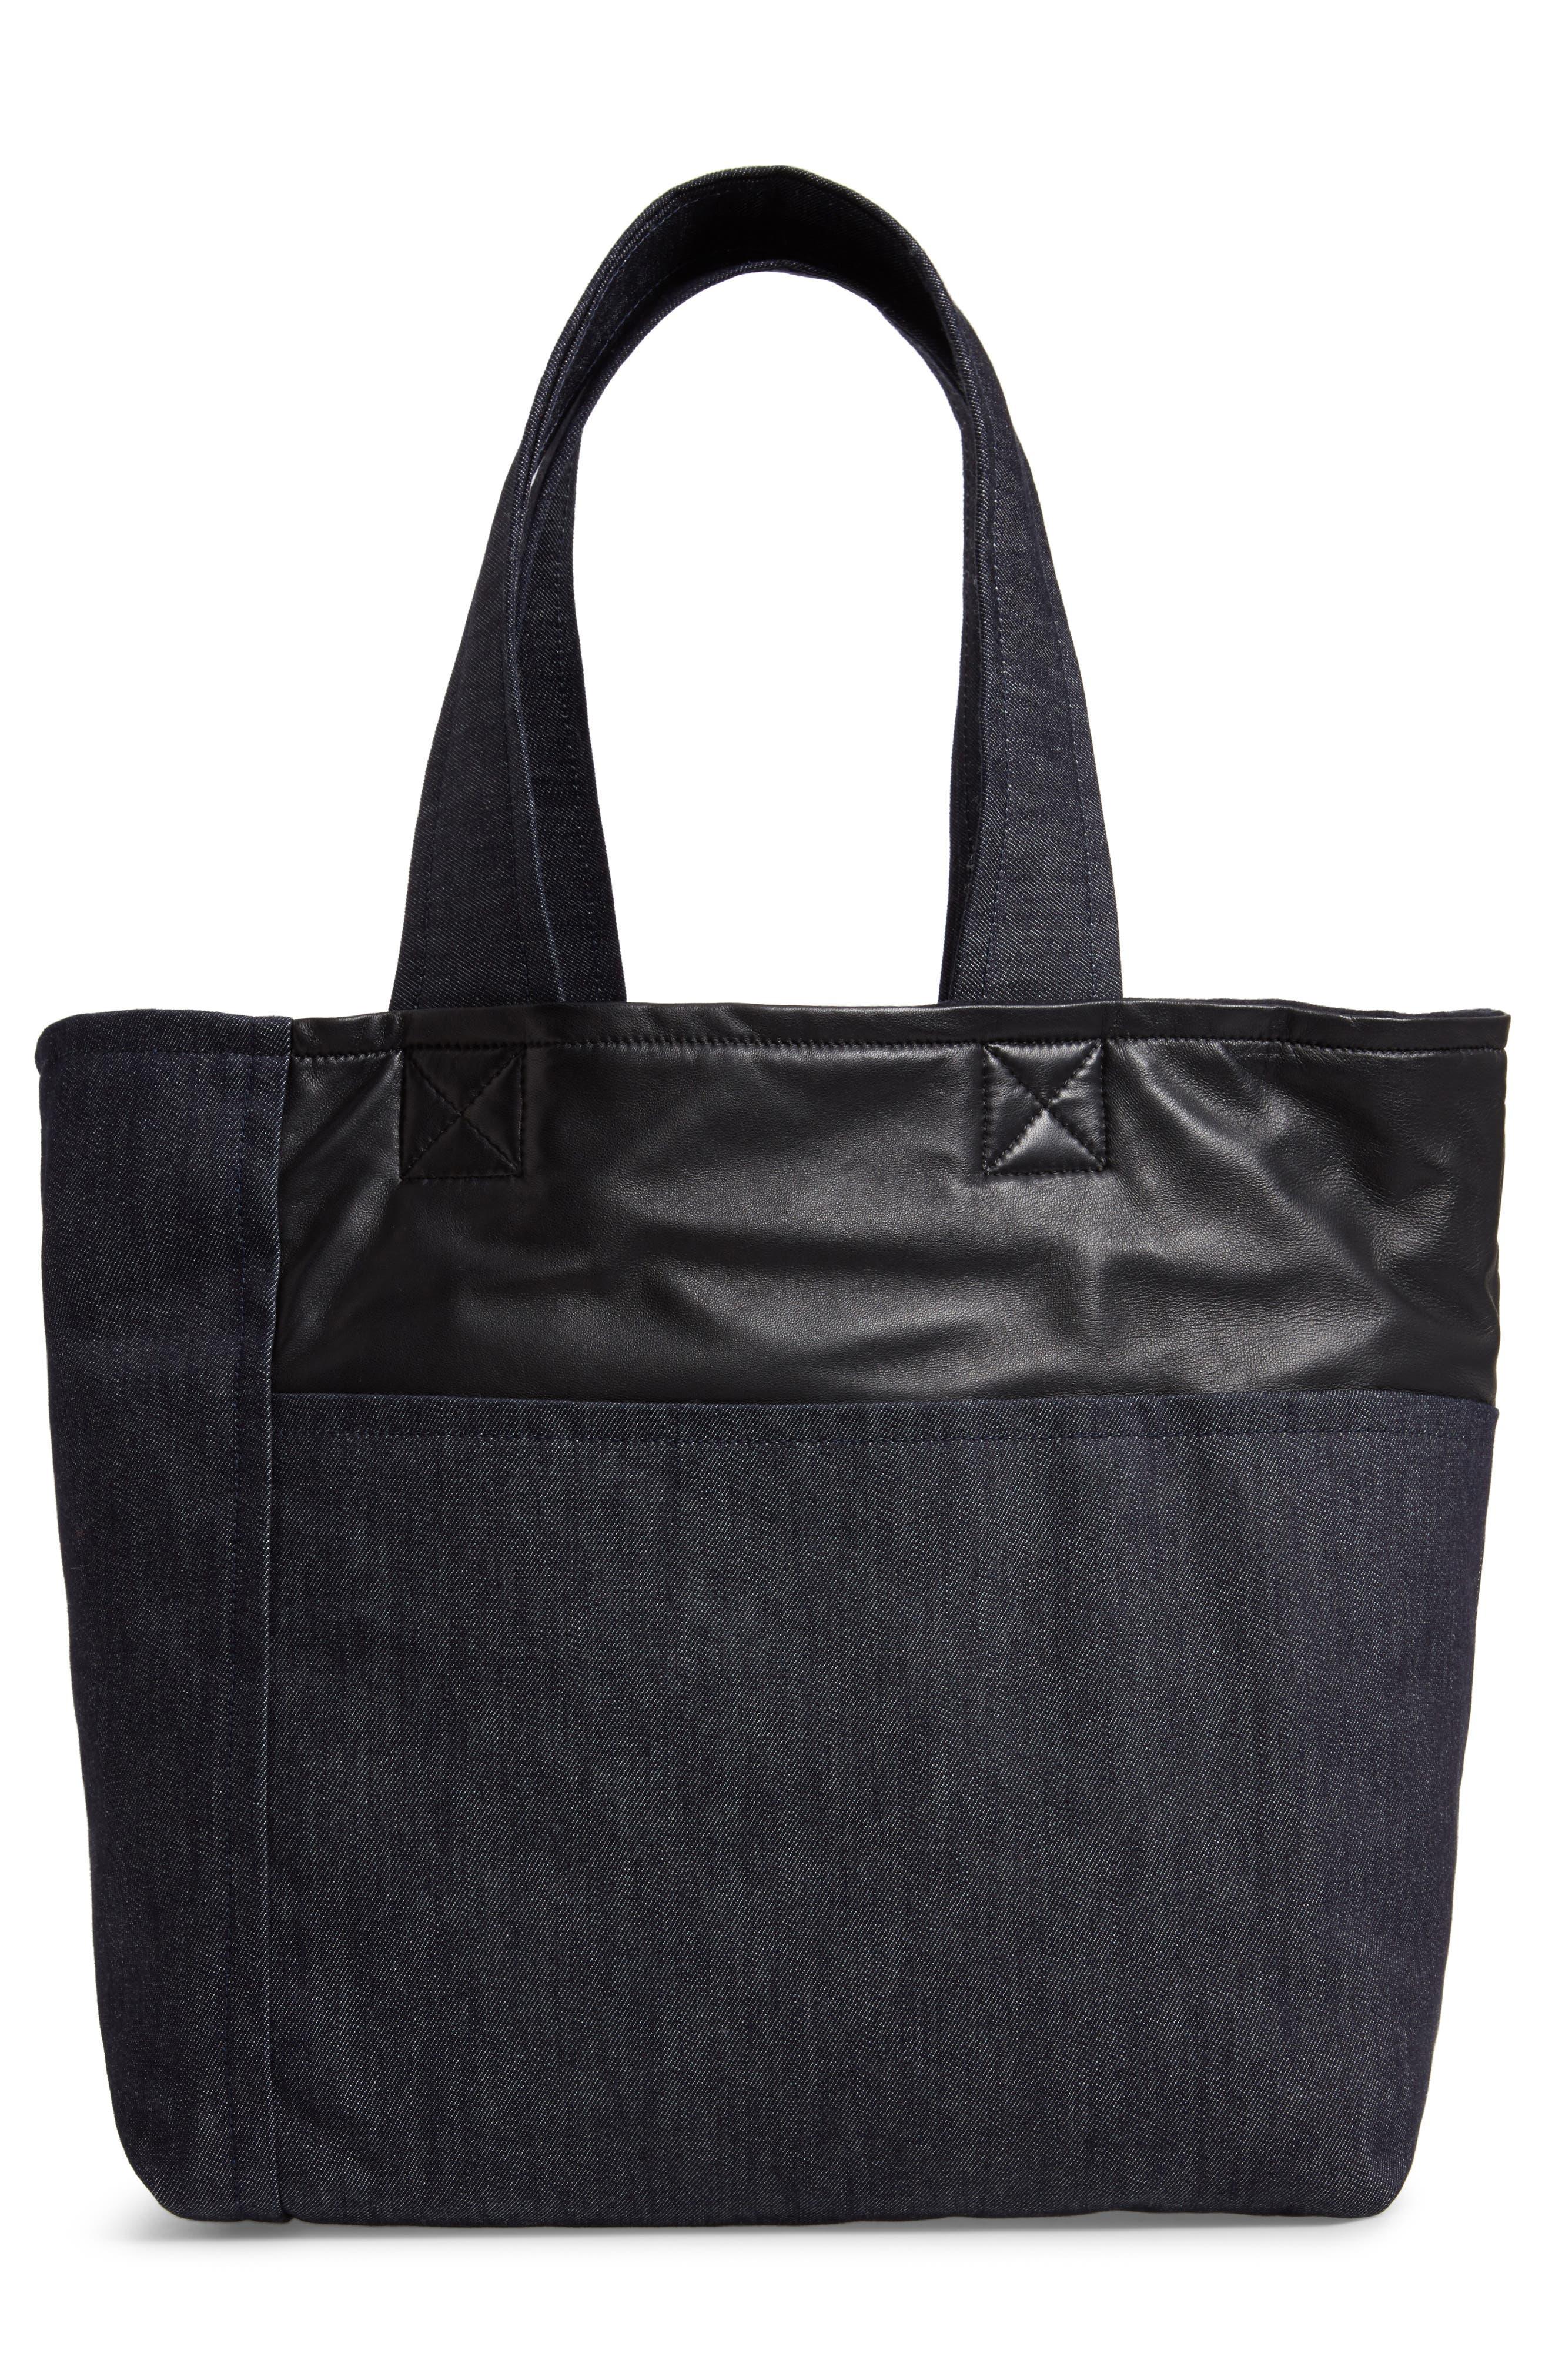 VICTORIA BECKHAM, Sunday Denim & Leather Tote Bag, Alternate thumbnail 3, color, 400